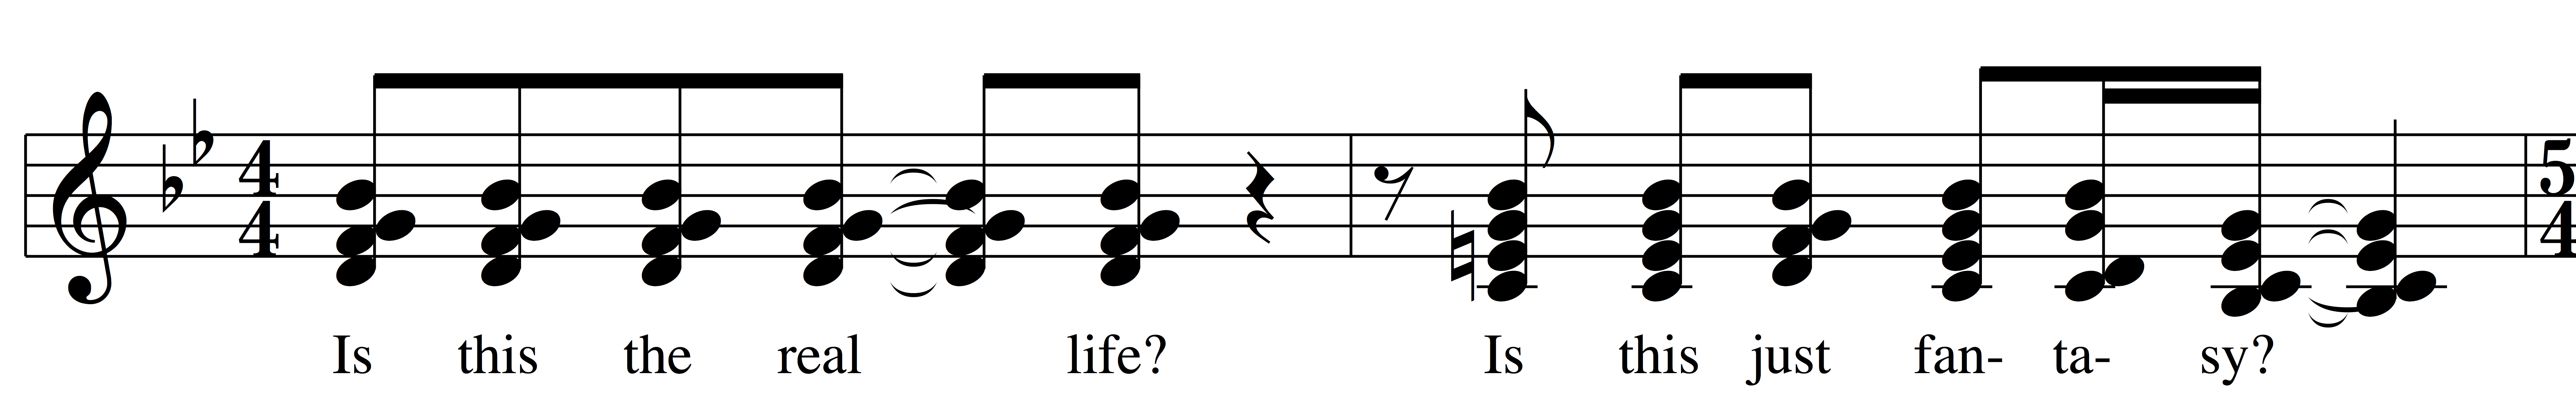 Bohemian notation.png